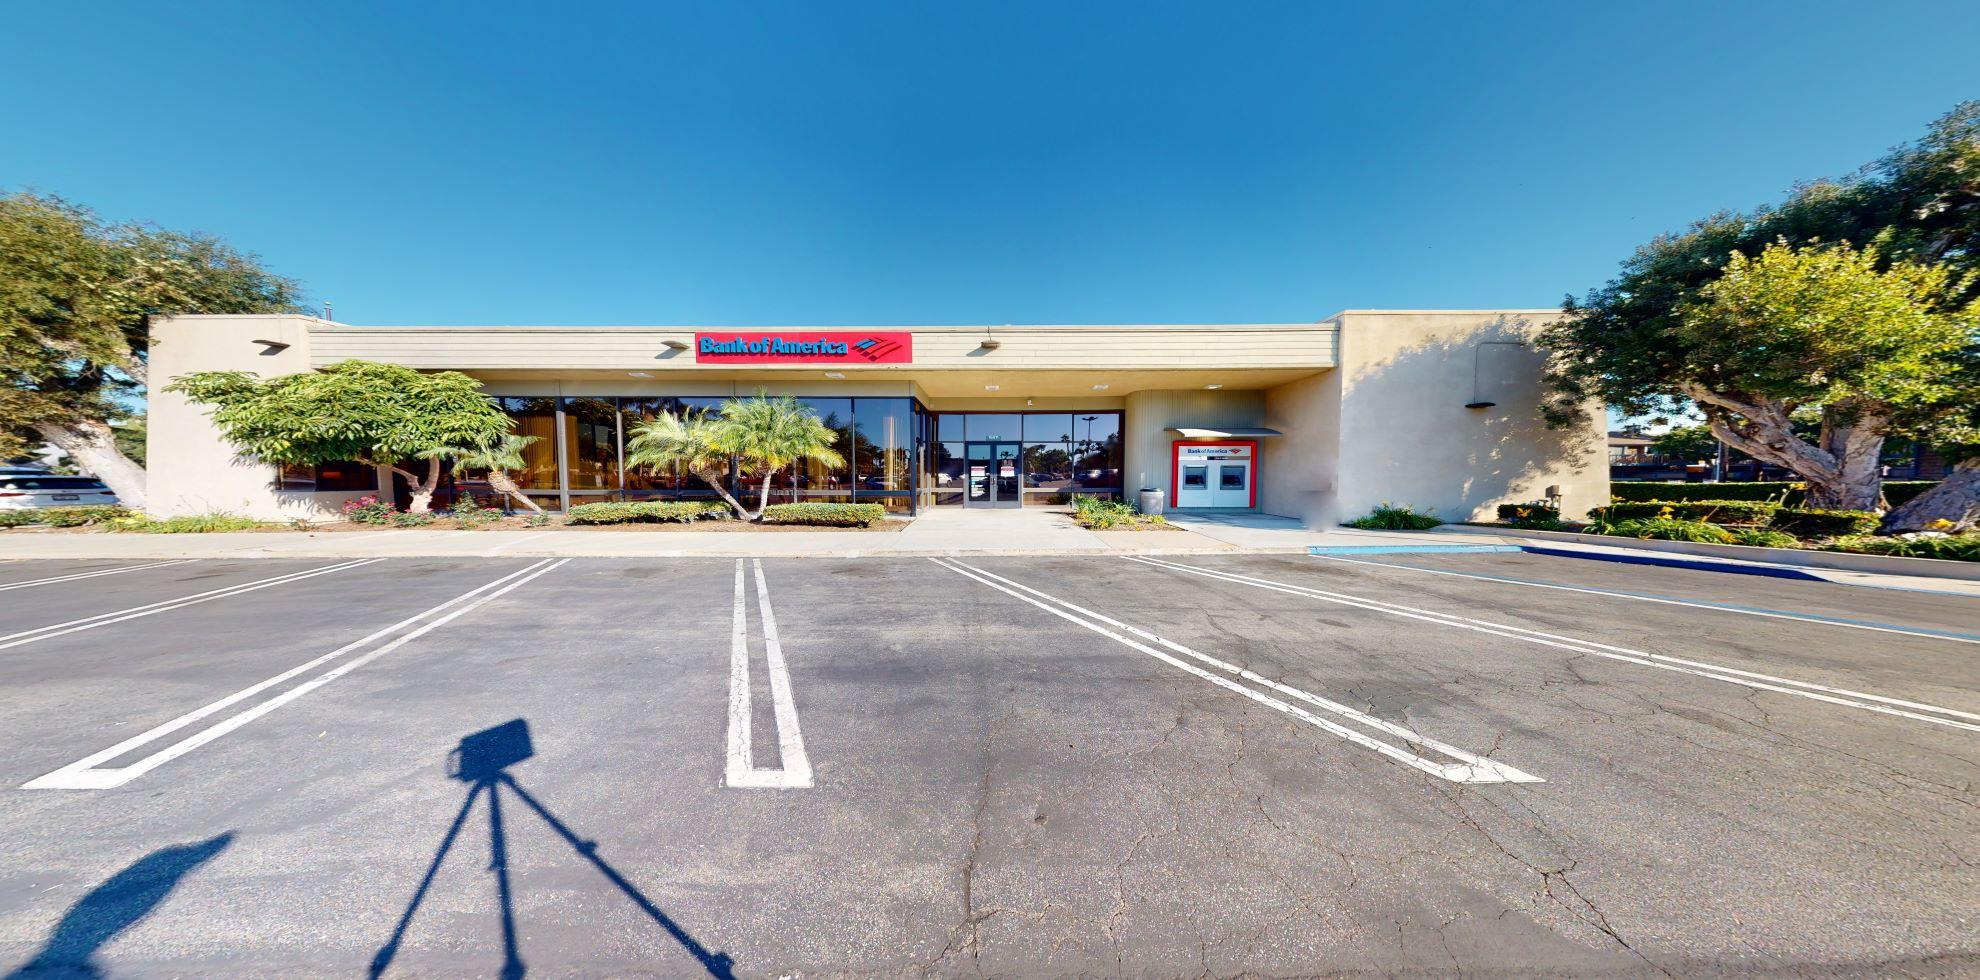 Bank of America financial center with drive-thru ATM   16811 Algonquin St, Huntington Beach, CA 92649